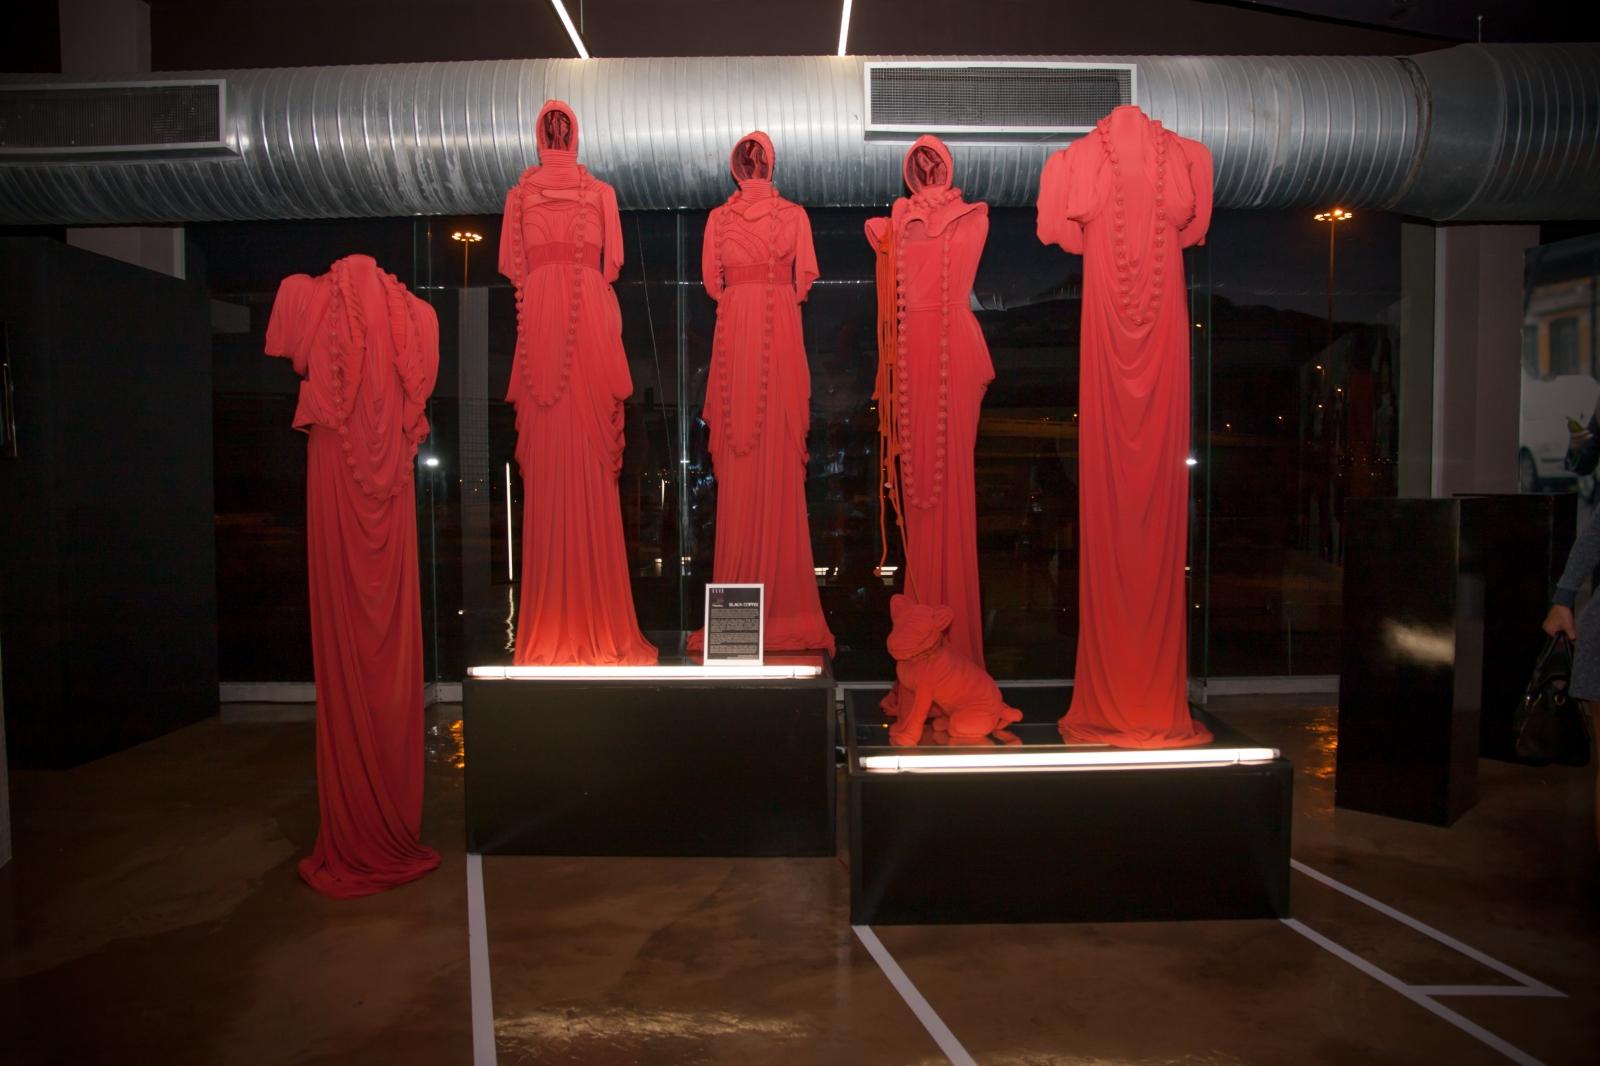 Suzaan Heyns, Elle Style Reporter Awards, Art Exhibitions